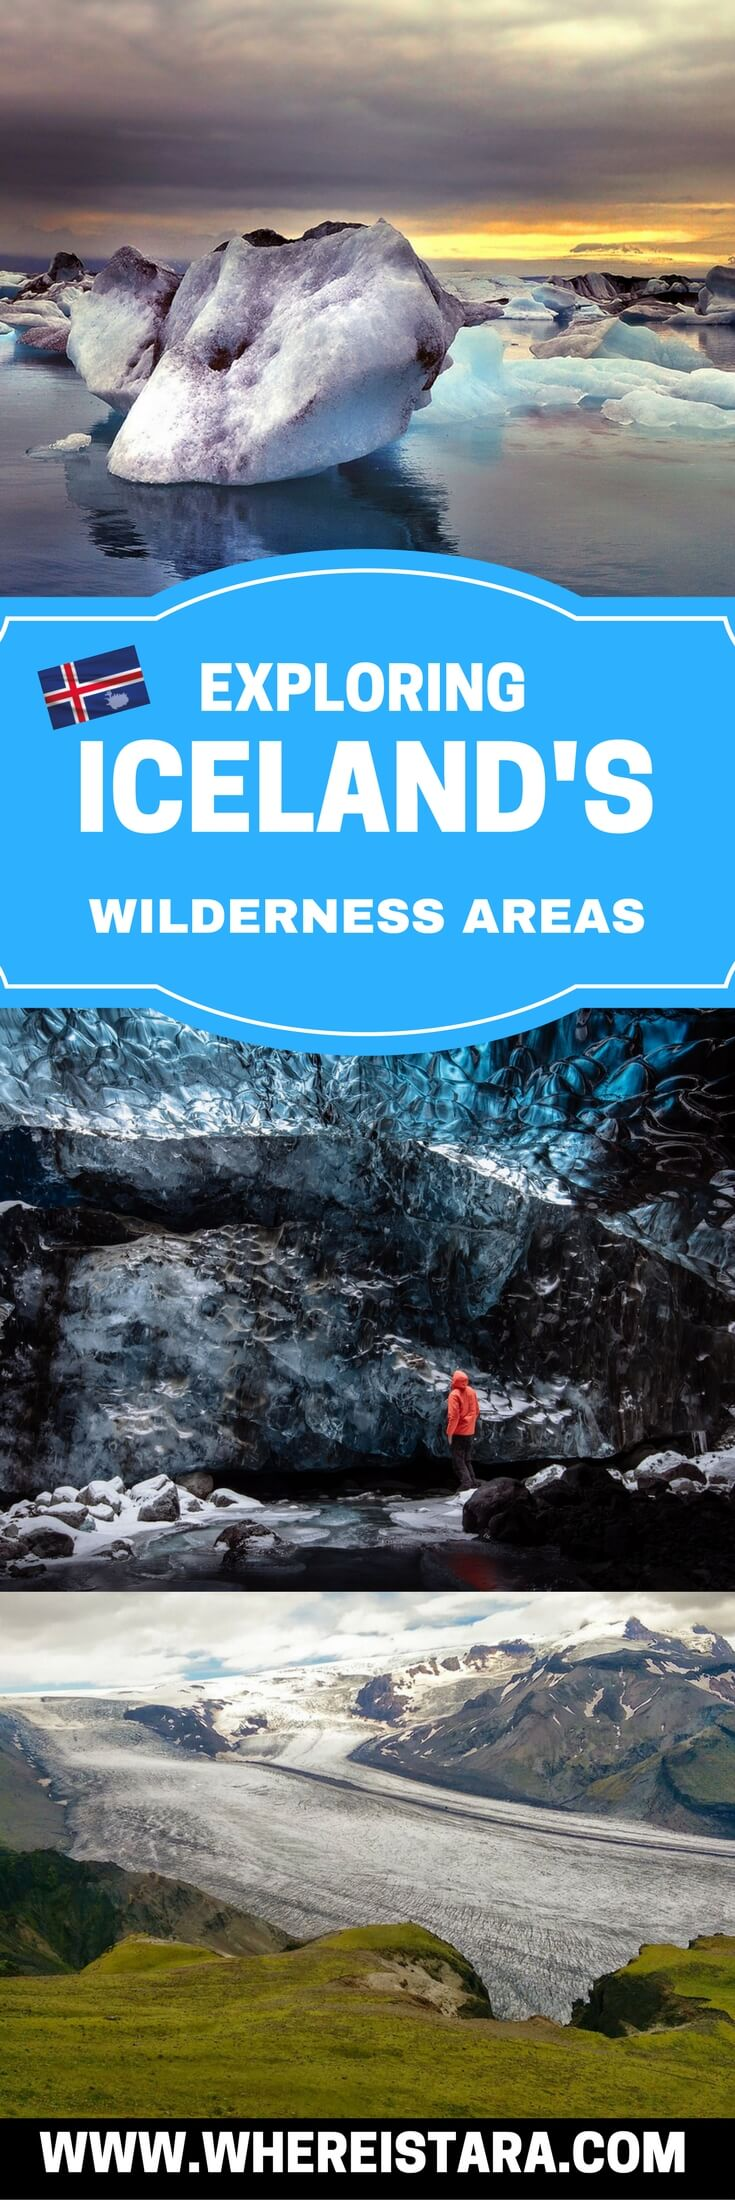 's wilderness areas where is tara povey top Irish travel blog